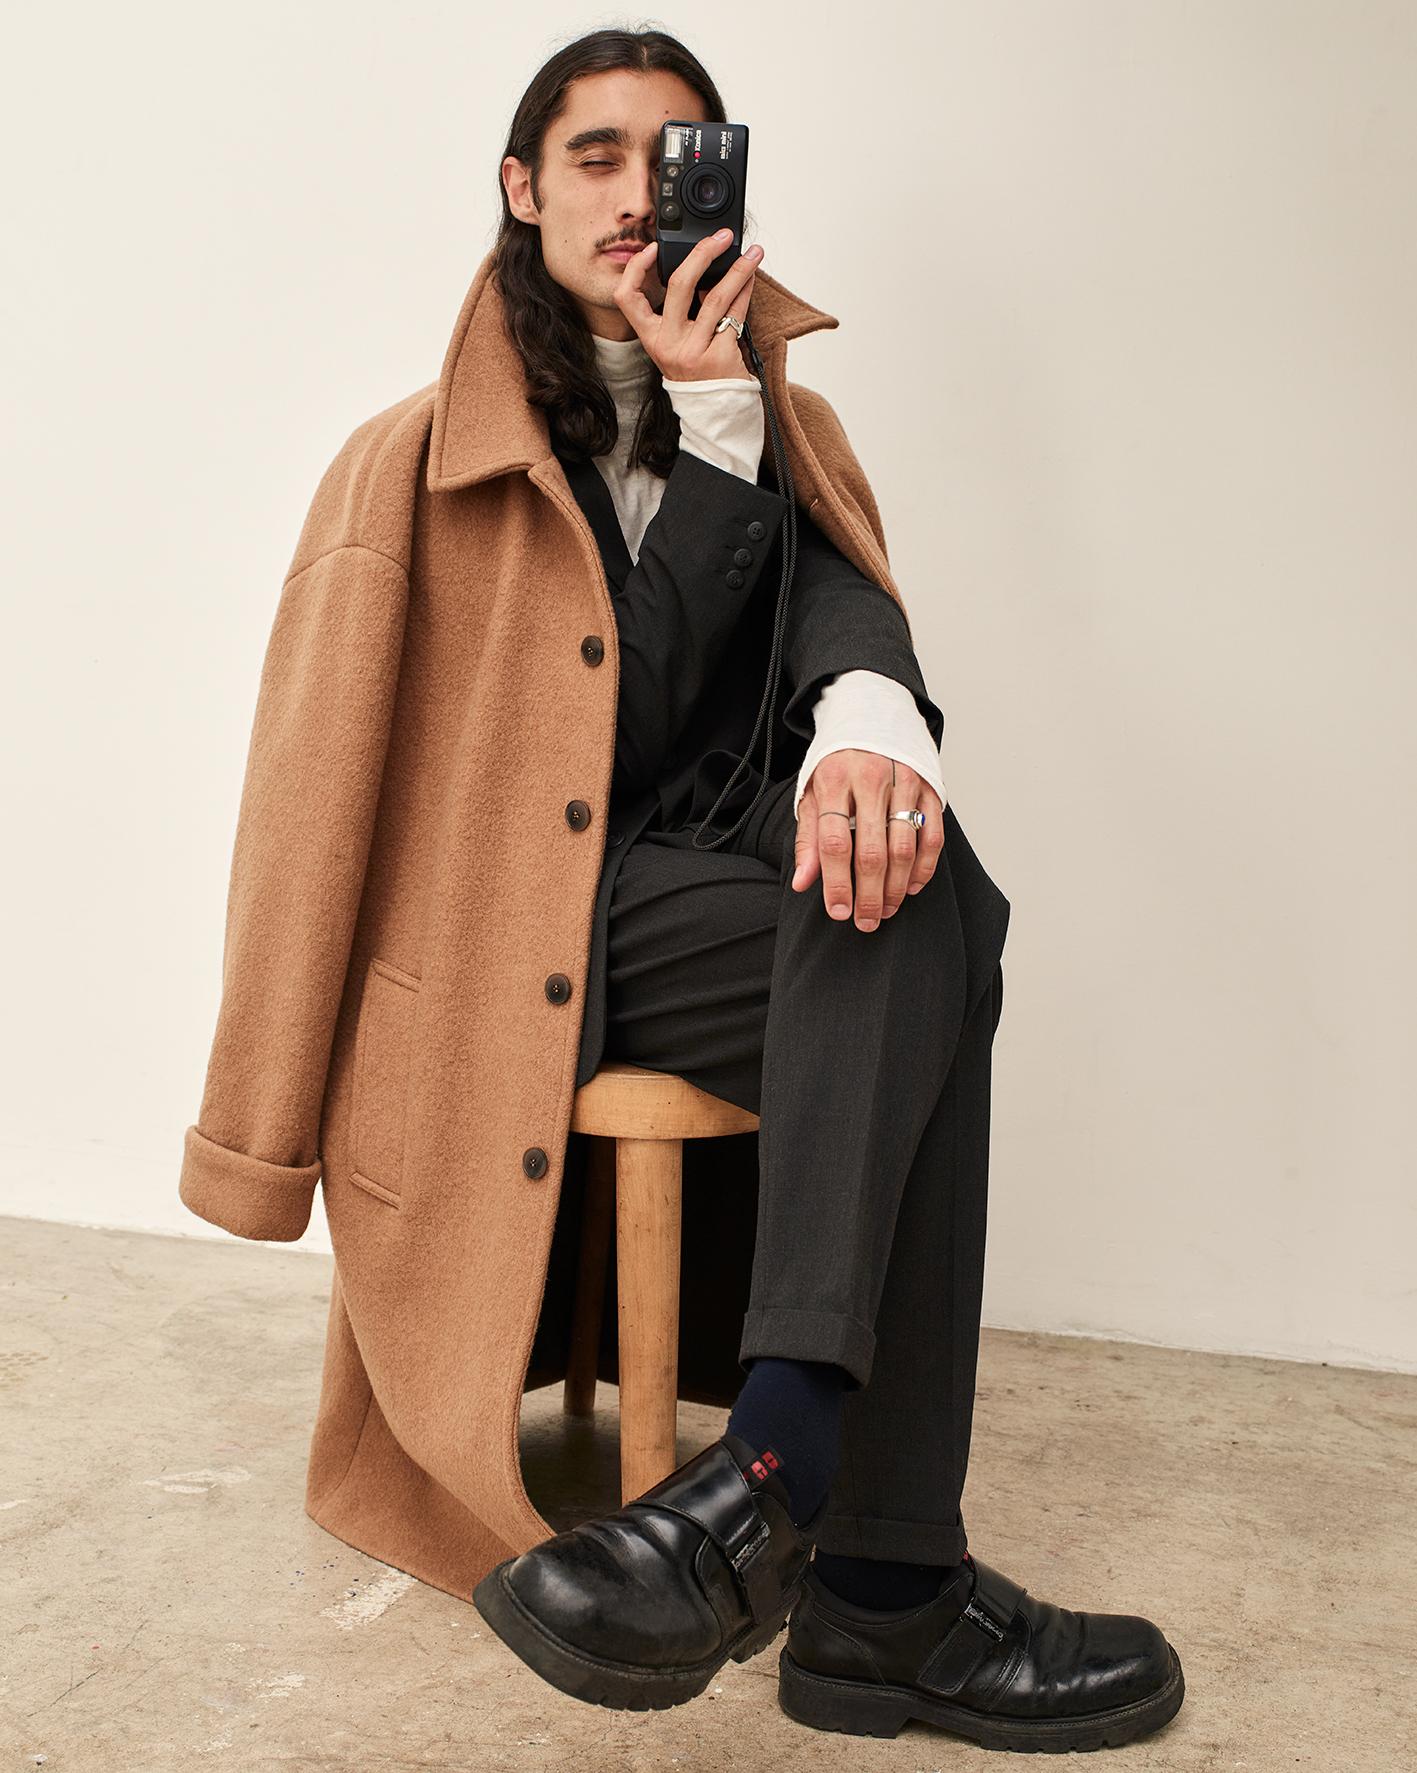 pantalon overcoat outfit heren